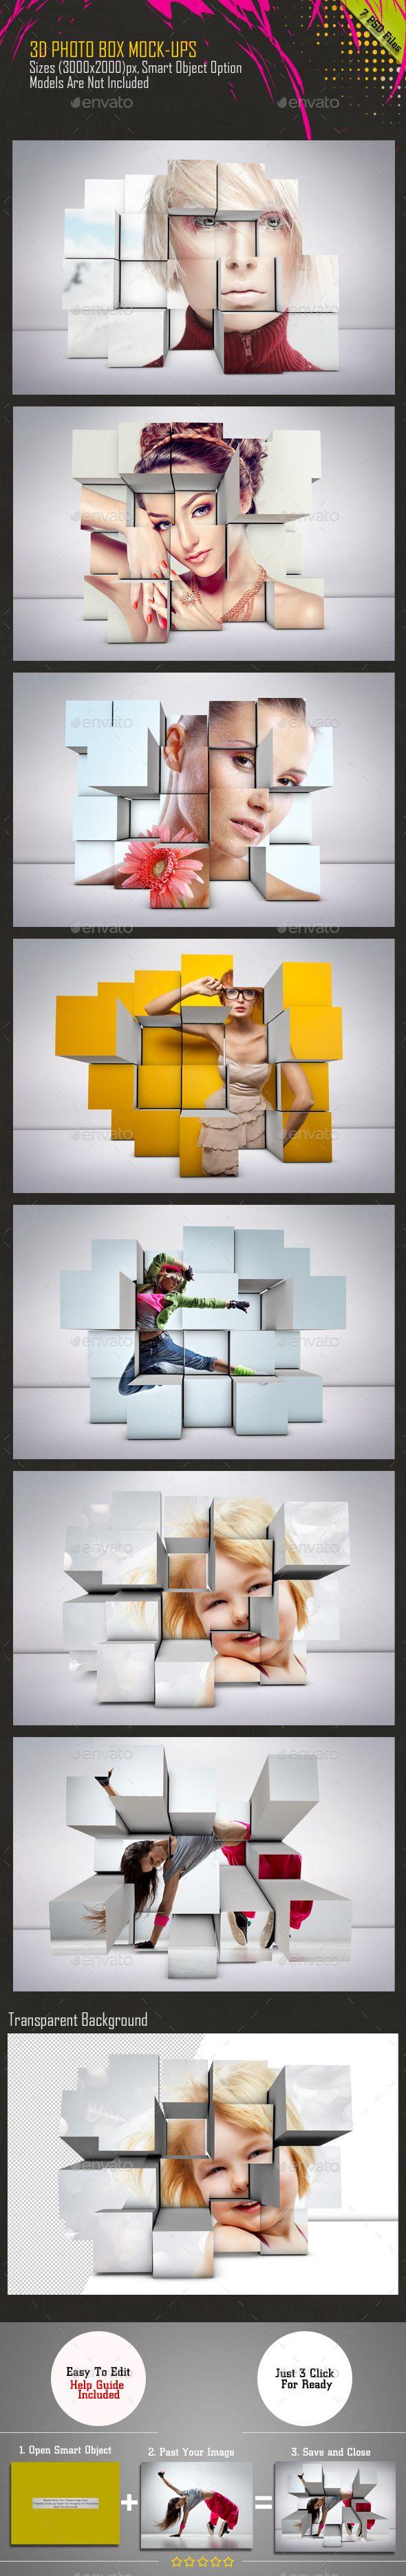 adobe photoshop templates